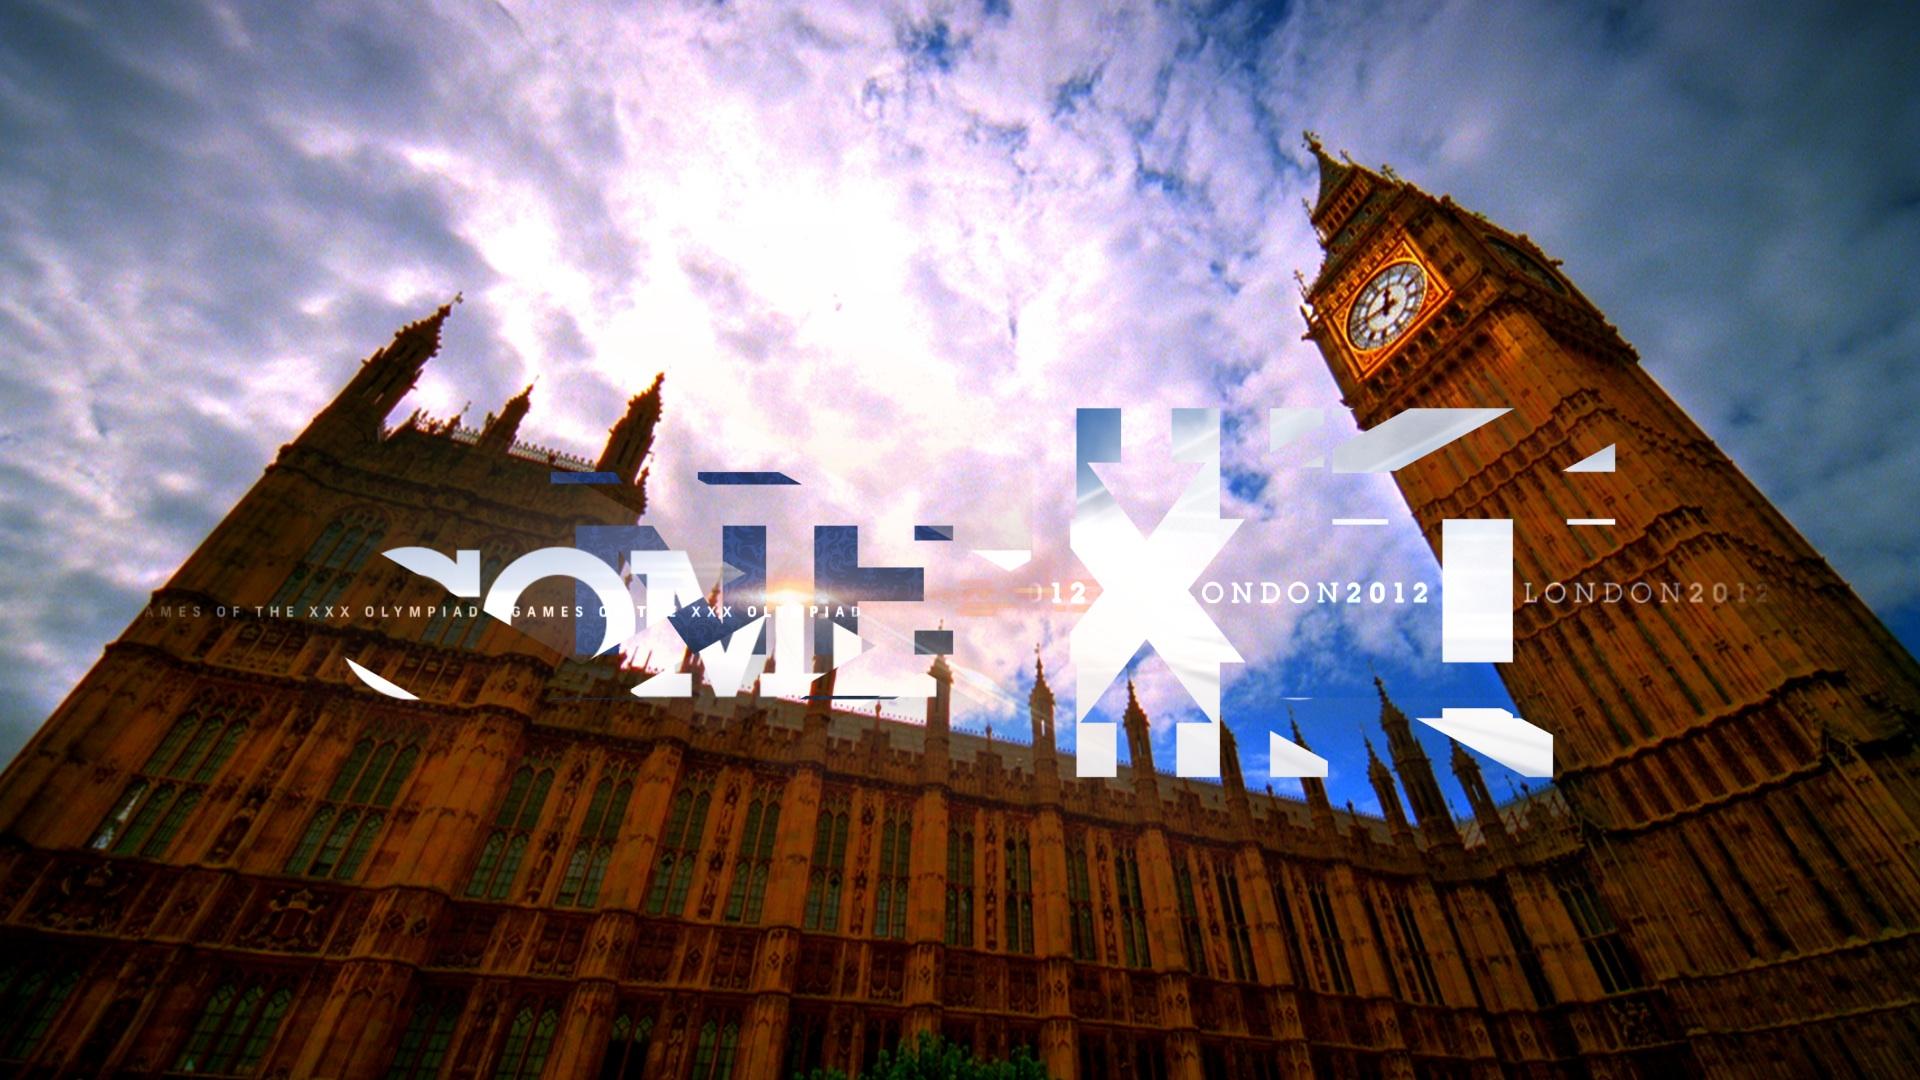 motion graphic design | London 2012 Olympics | jonberrydesign